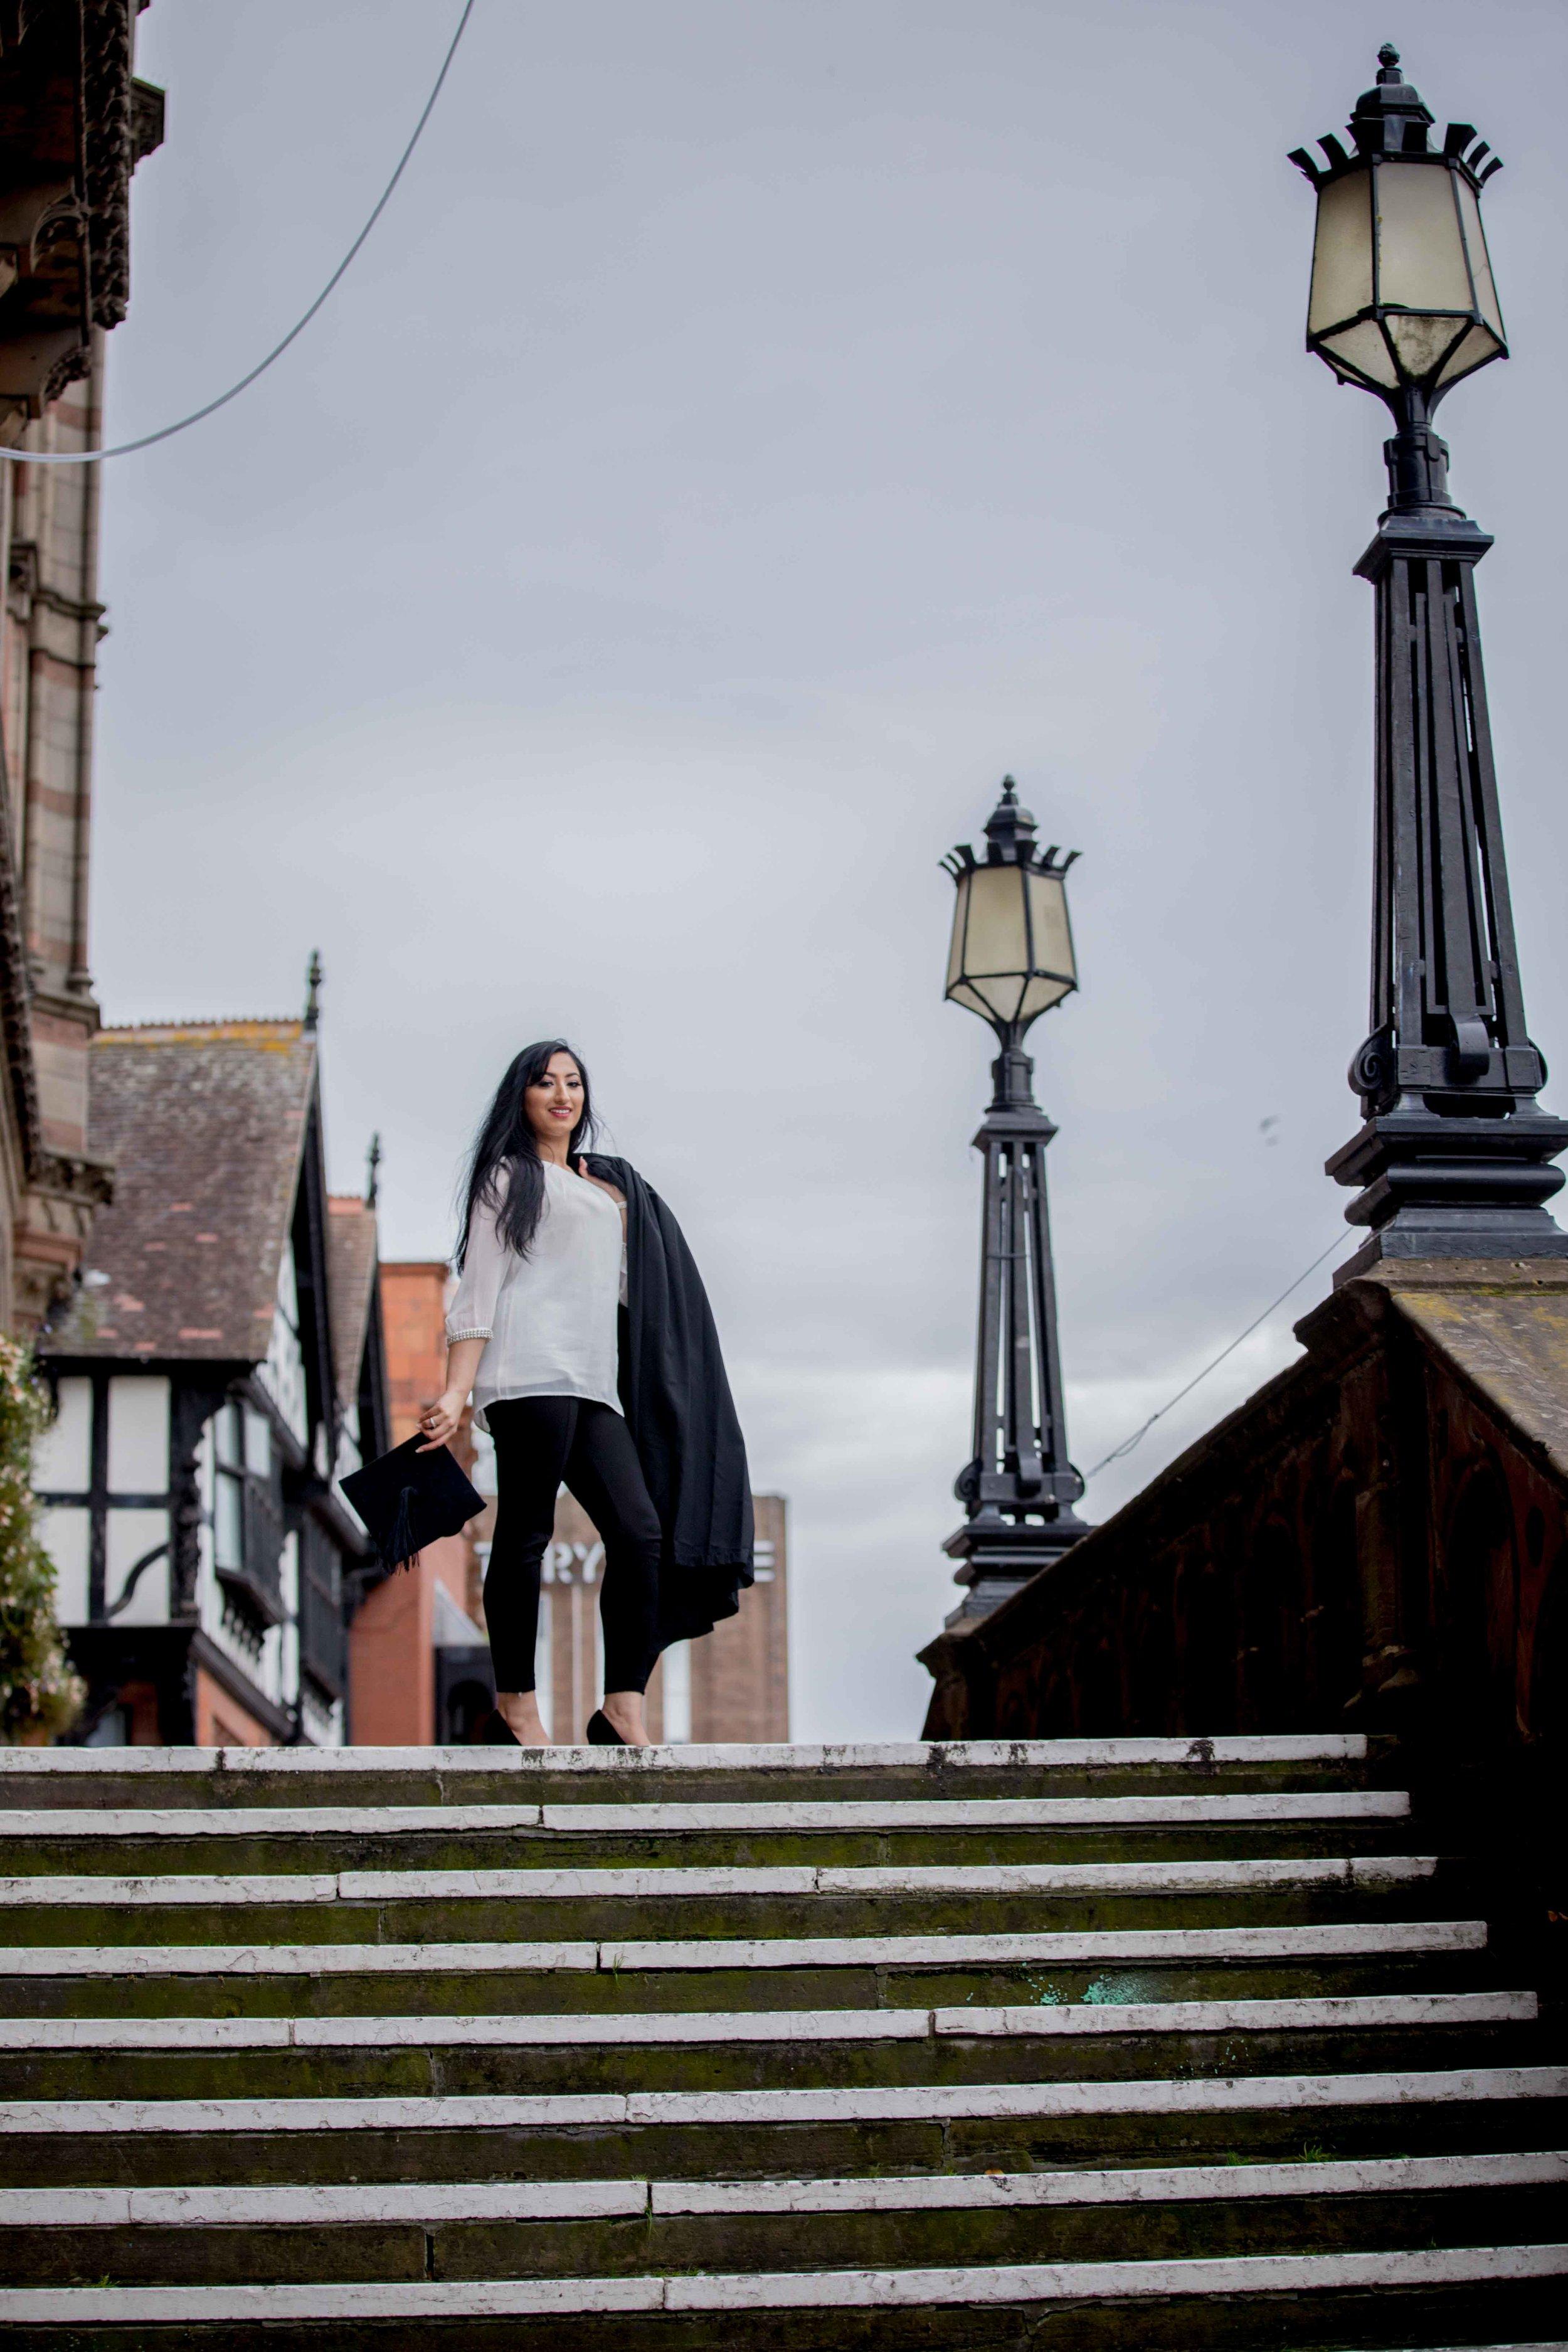 chester-university-graduation-ceremony-photography-photoshoot-graduation-photographer-Bristol-London-Cardiff-Birmingham-Chester-Natalia-smith-photography-10.jpg